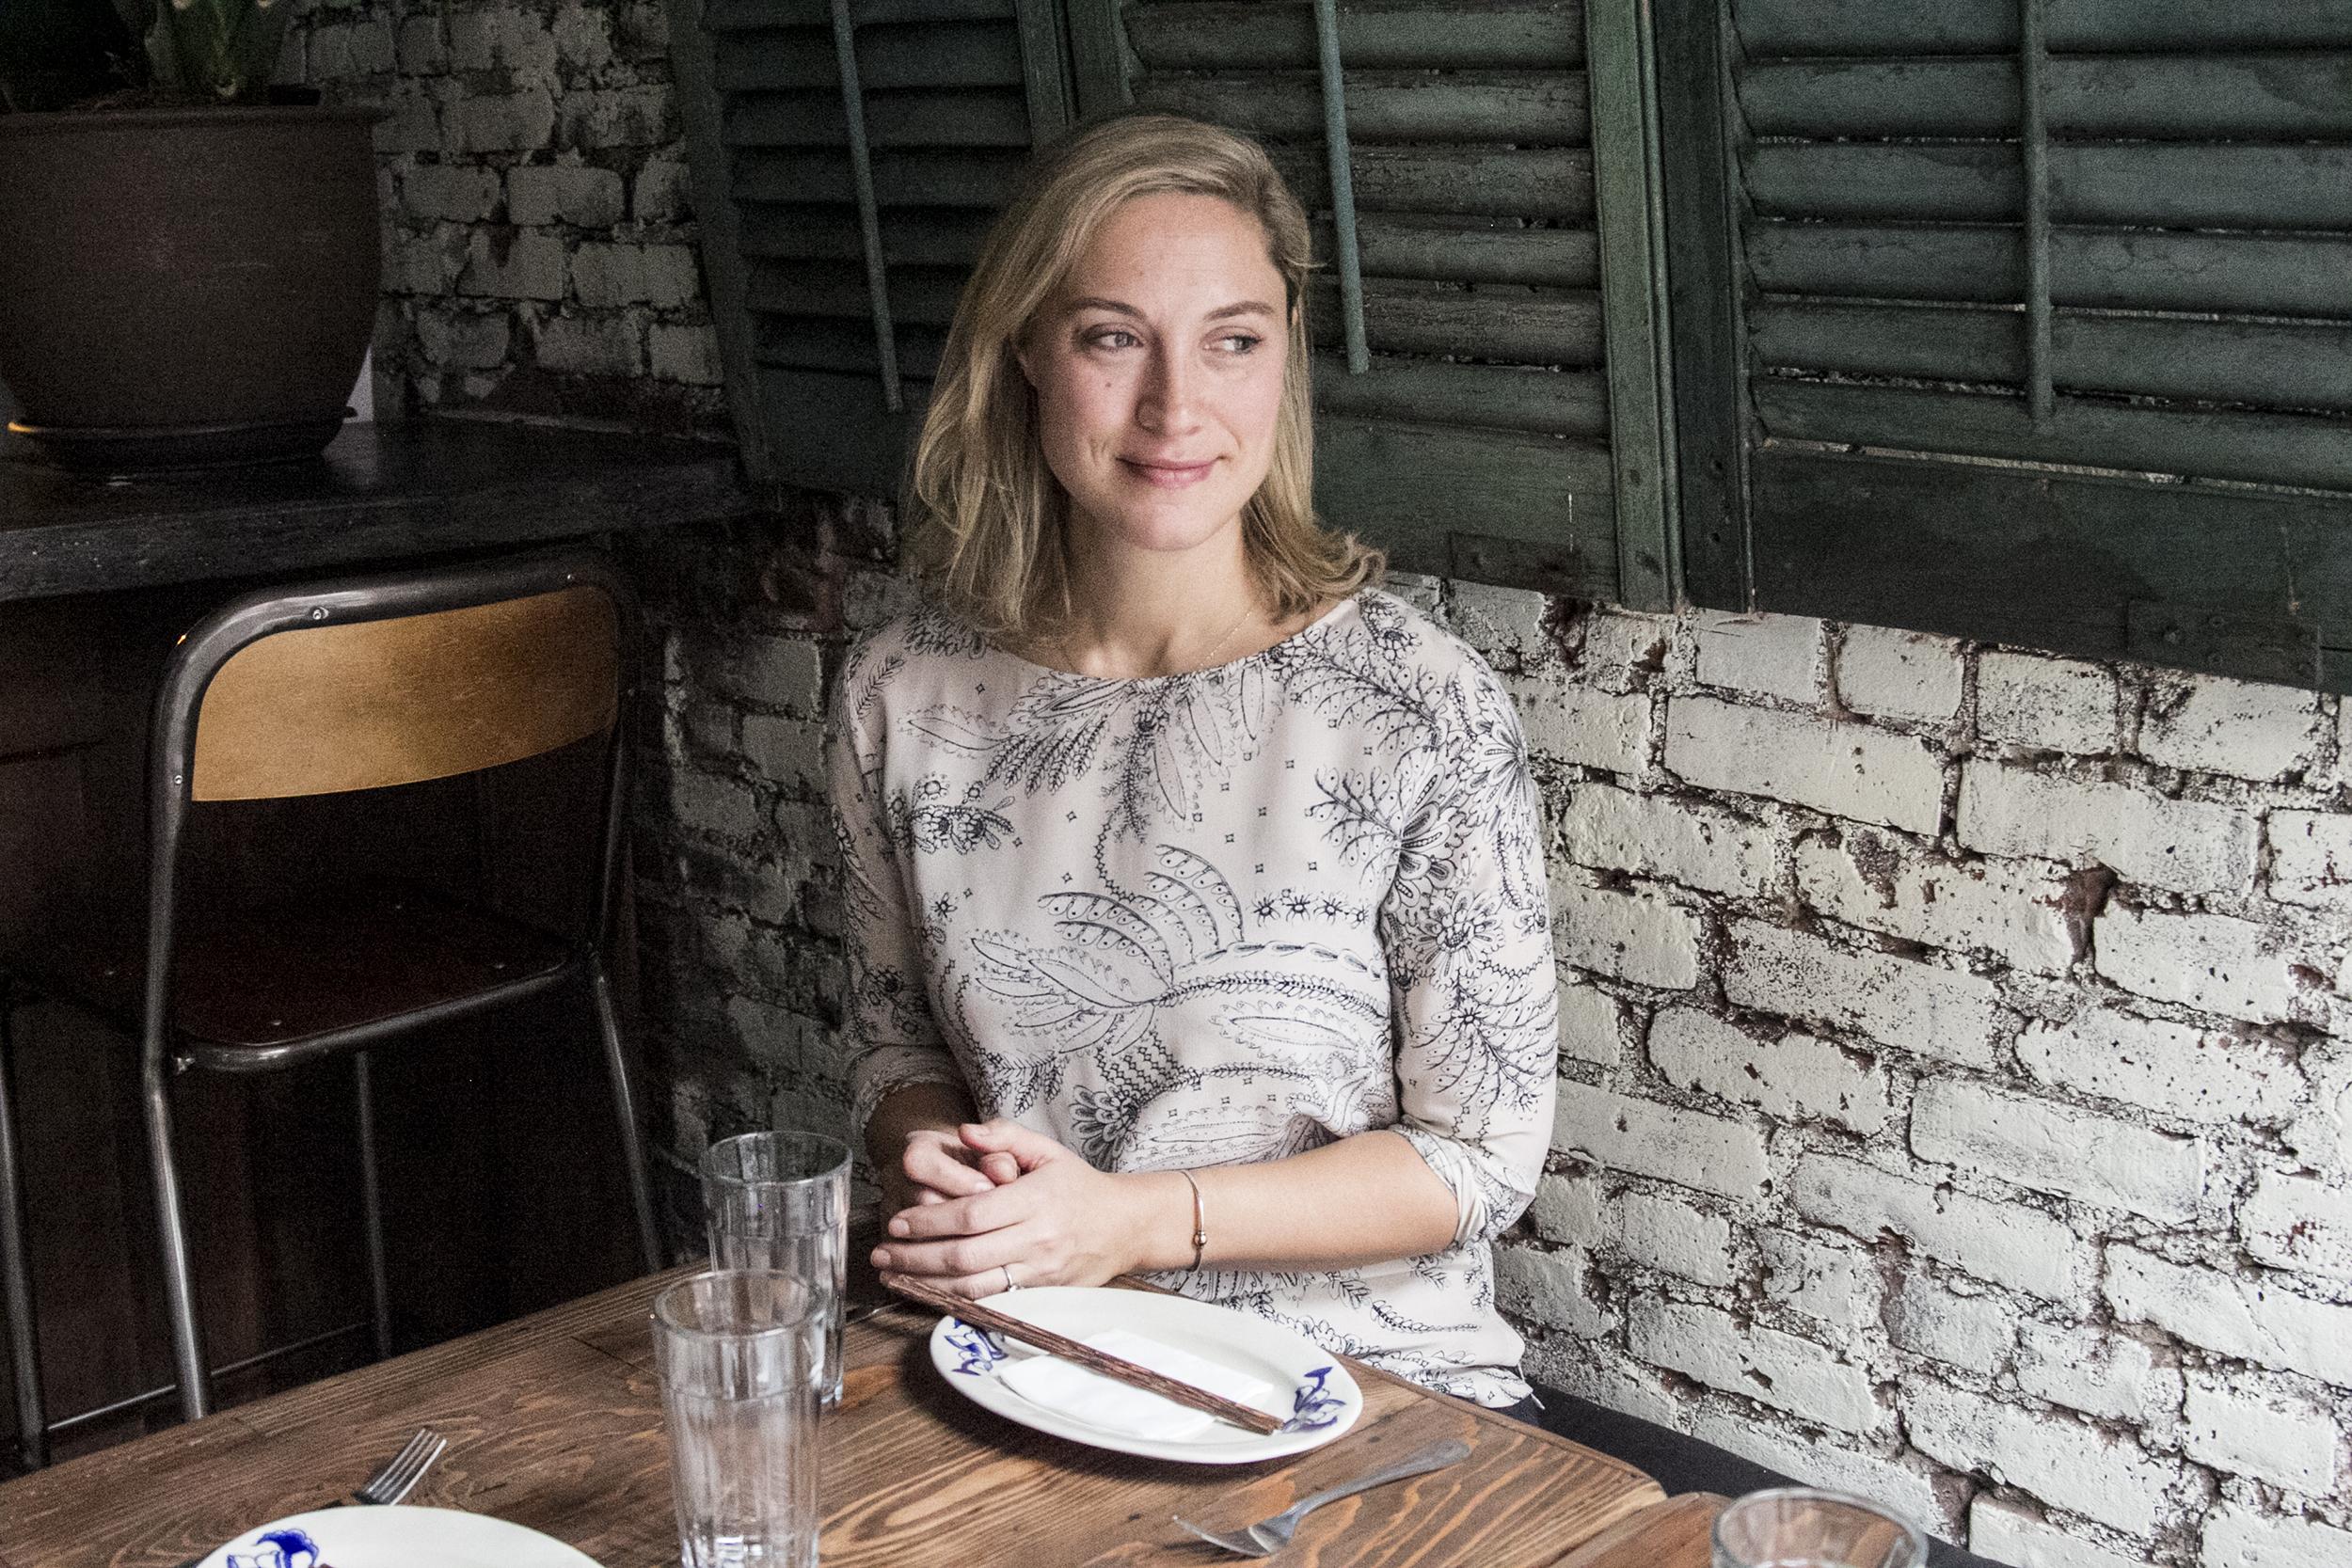 Hanoi House founder Sara Leveen